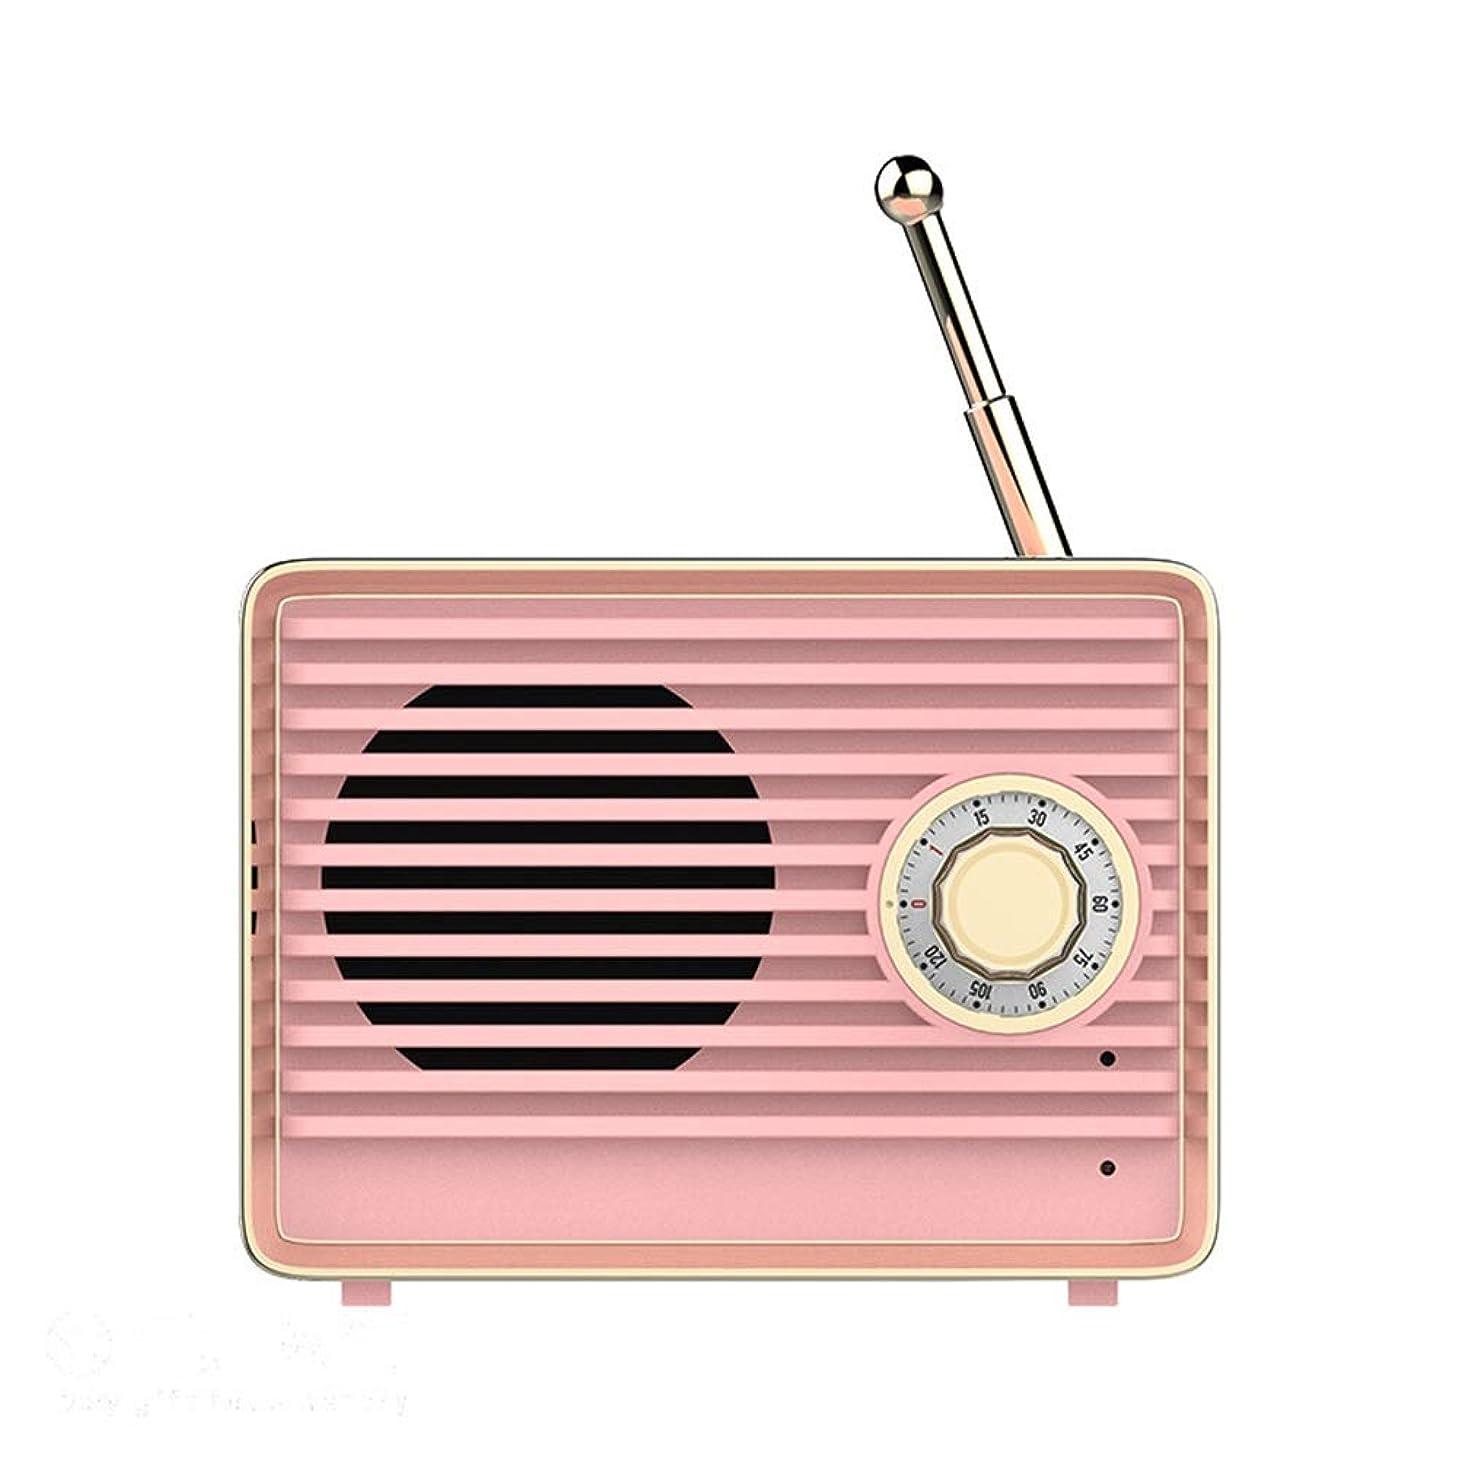 YsinoBear Wireless Retro Speaker with FM Radio, Portable Bluetooth Vintage Speaker with Built-in Mic, for Kitchen/Bedrooms/Desk/Shelf/Party/Travel Speaker